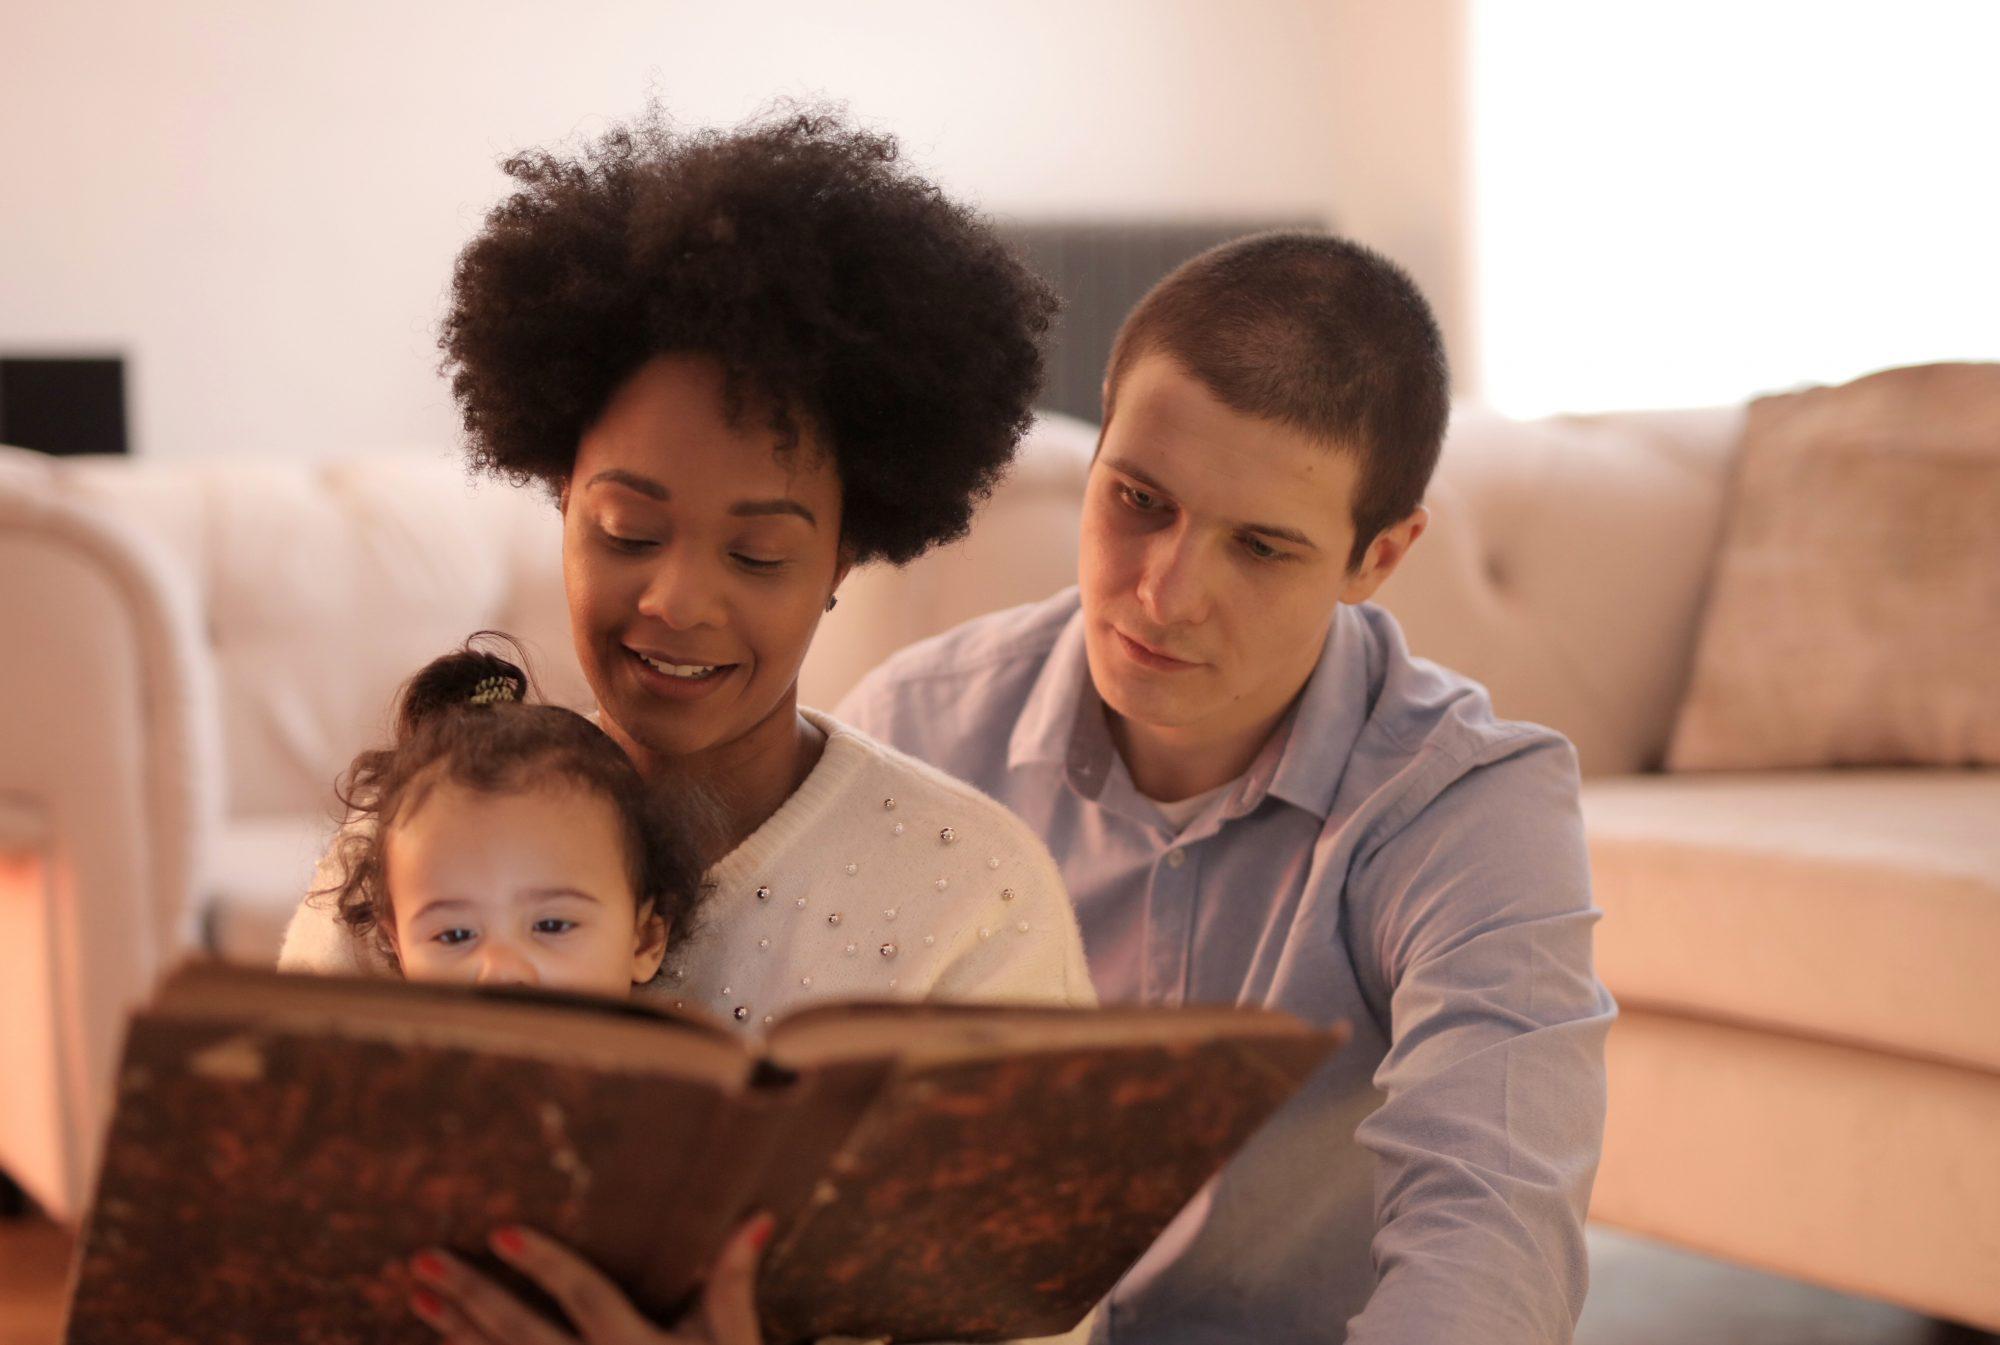 family-reading-story-book-3820203